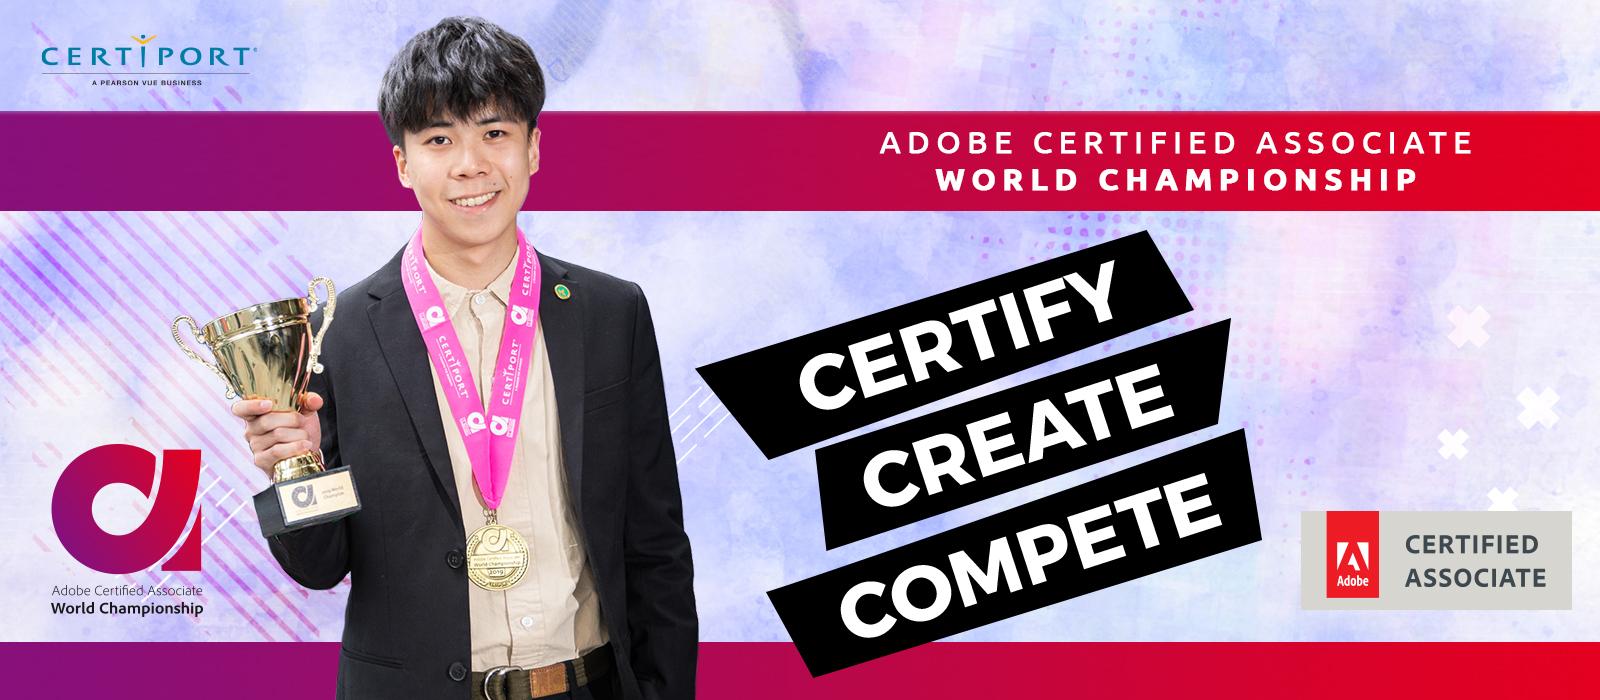 Adobe Certified Associate World Championship Orlando, Florida